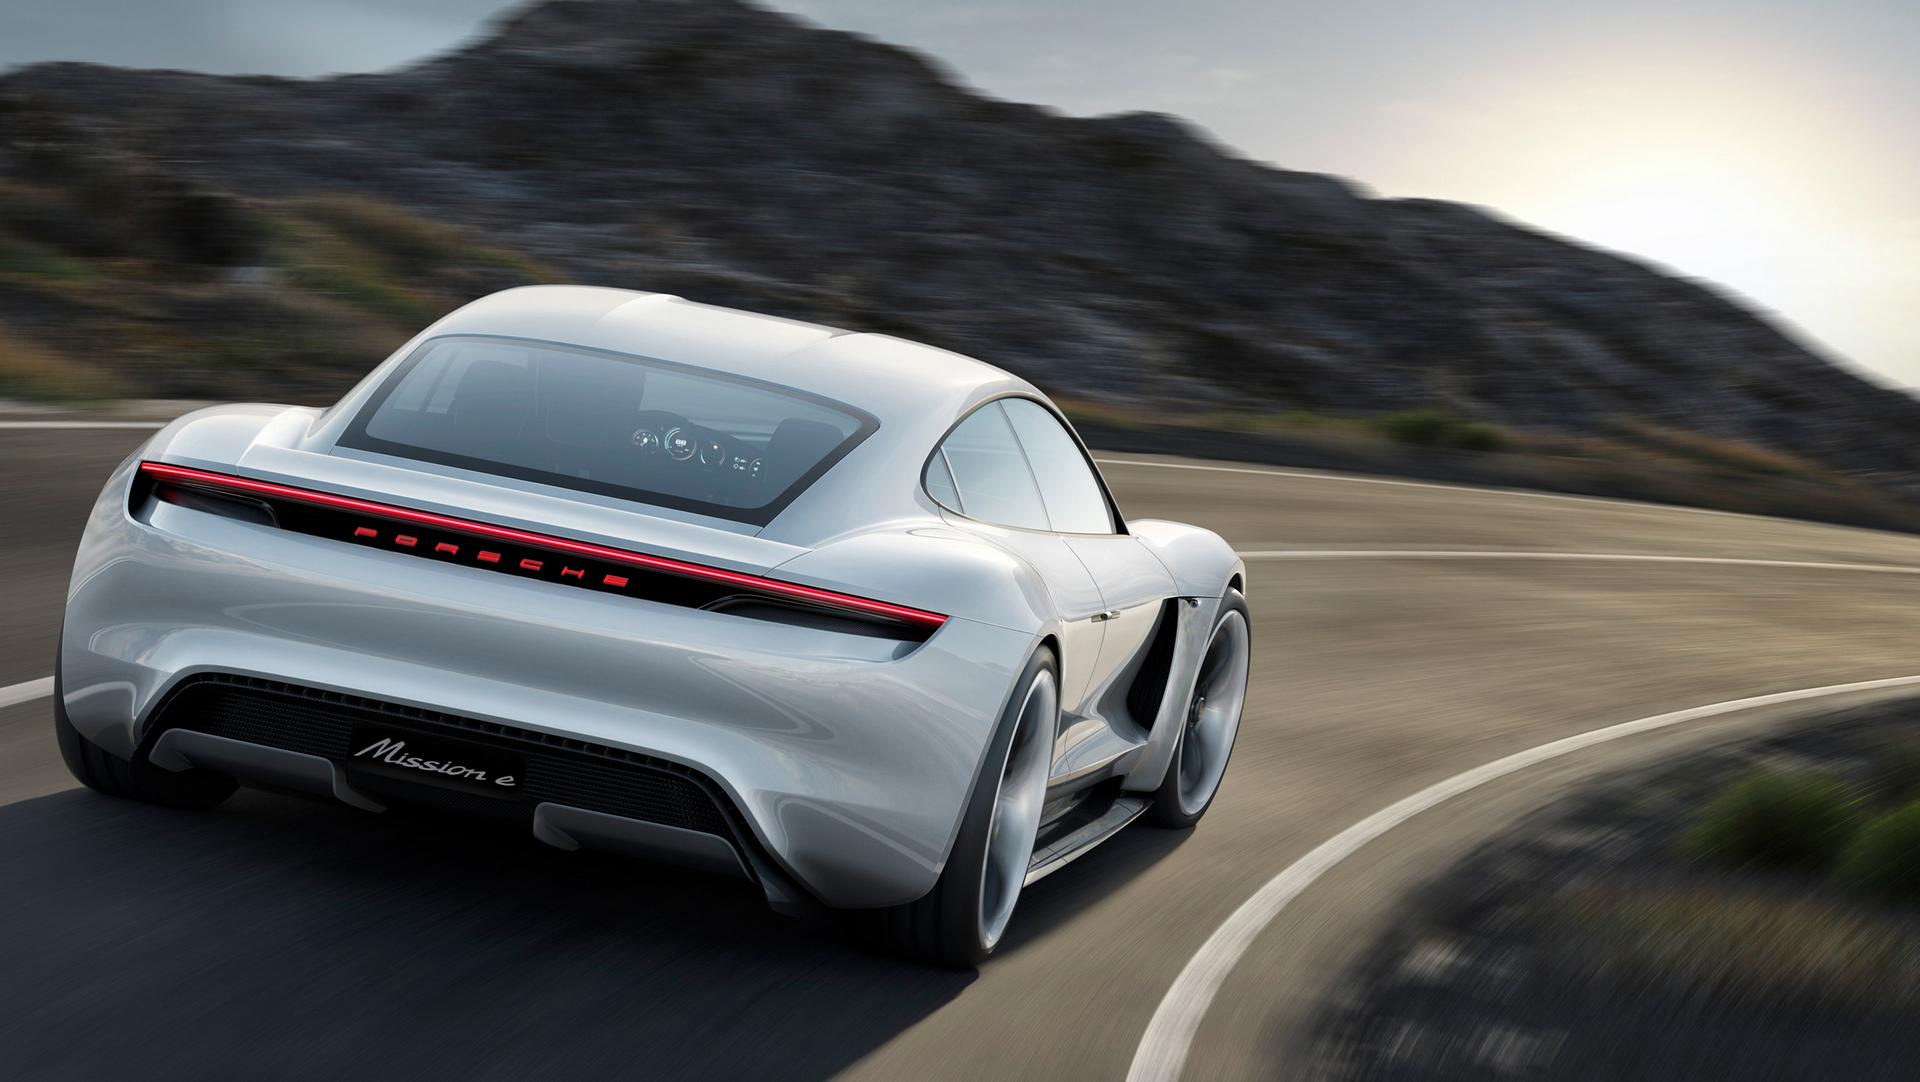 Mission E © Dr. Ing. h.c. F. Porsche AG